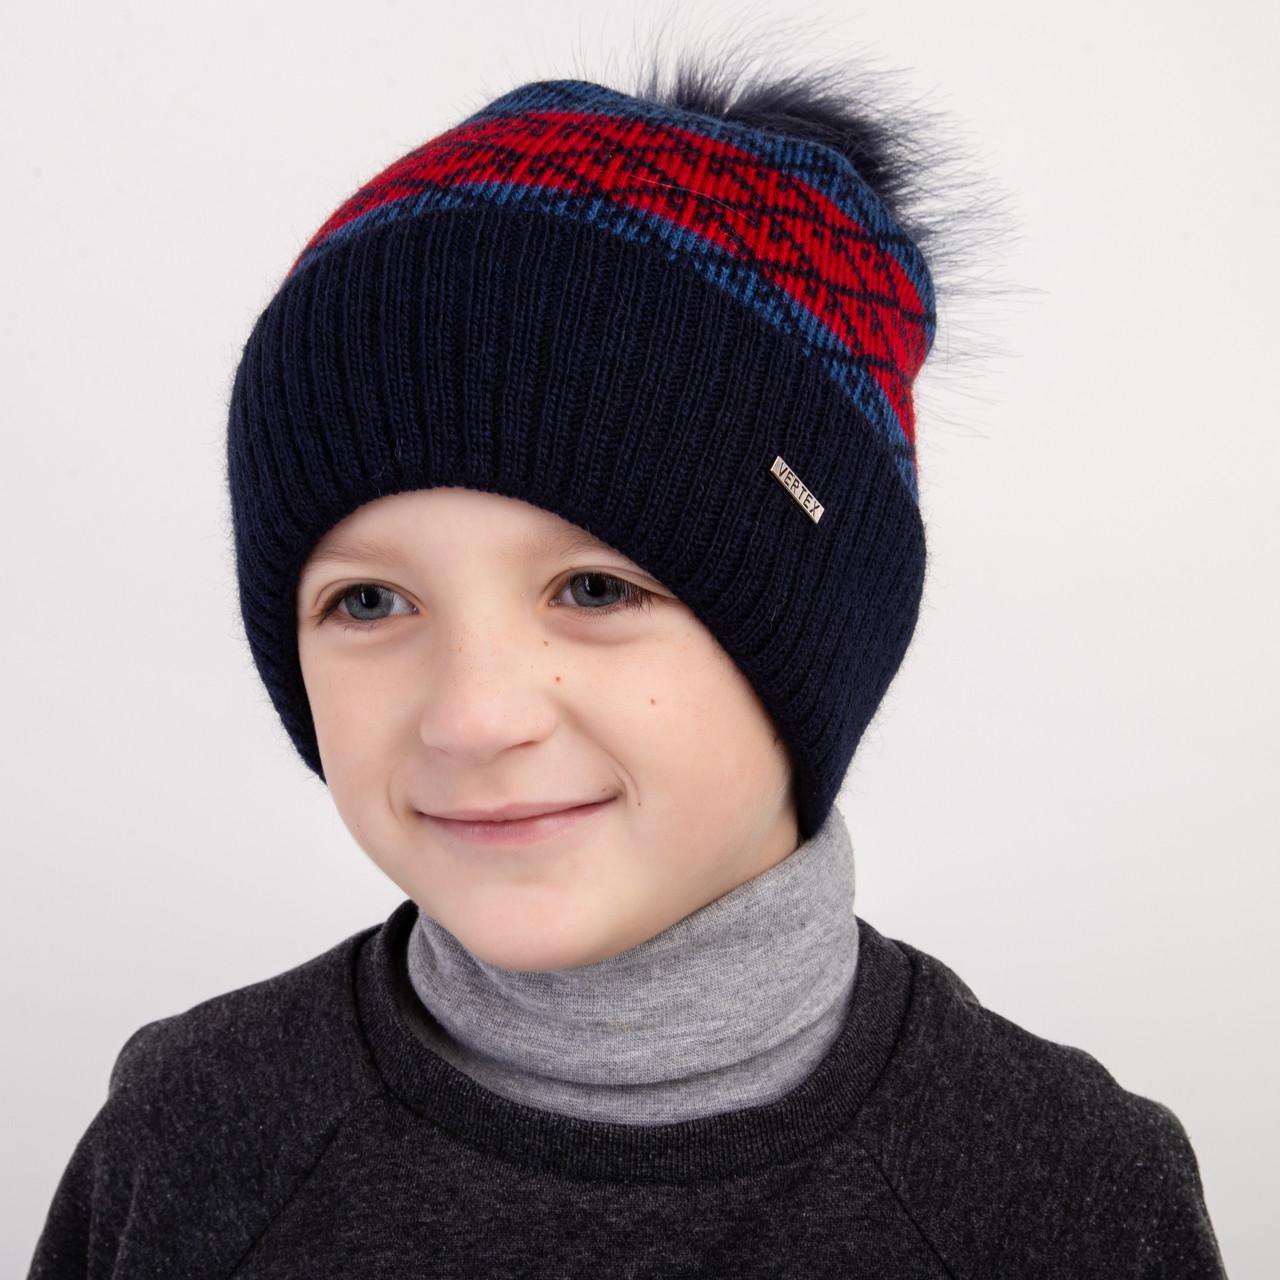 Шапка на зиму для мальчика оптом - Артикул 2391